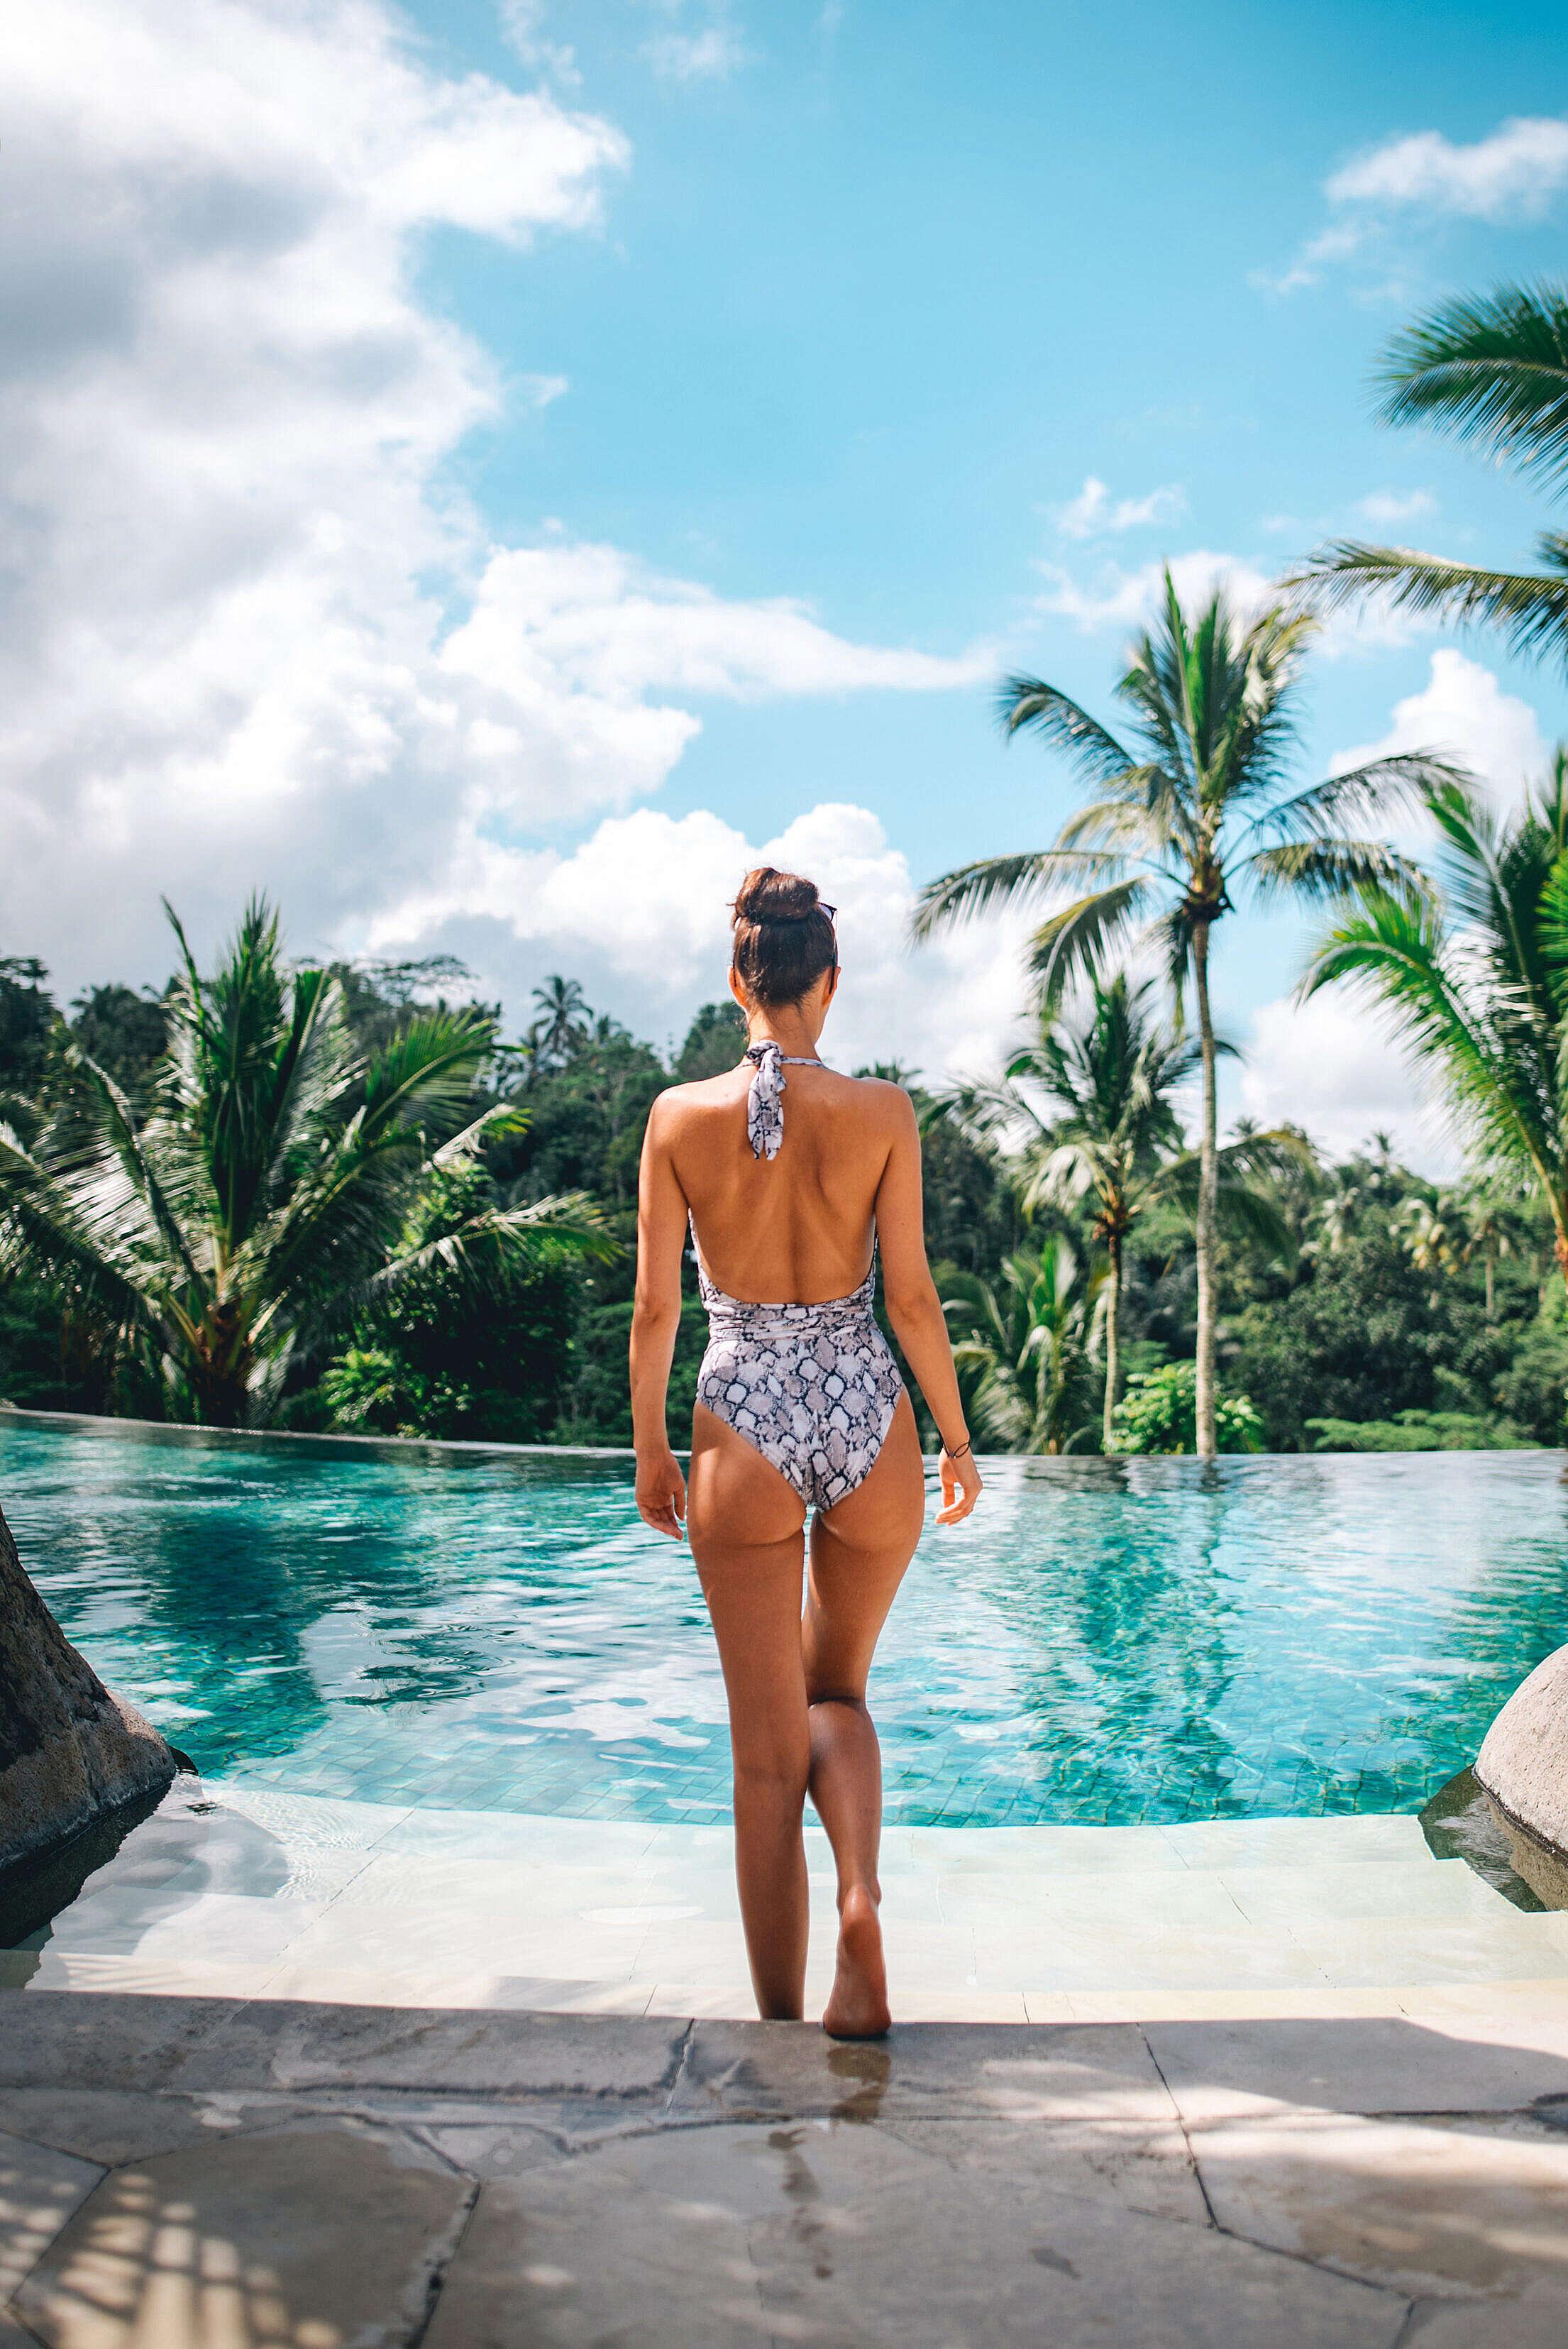 Young Woman Enjoying Luxury & Exotic Swimming Pool Free Stock Photo